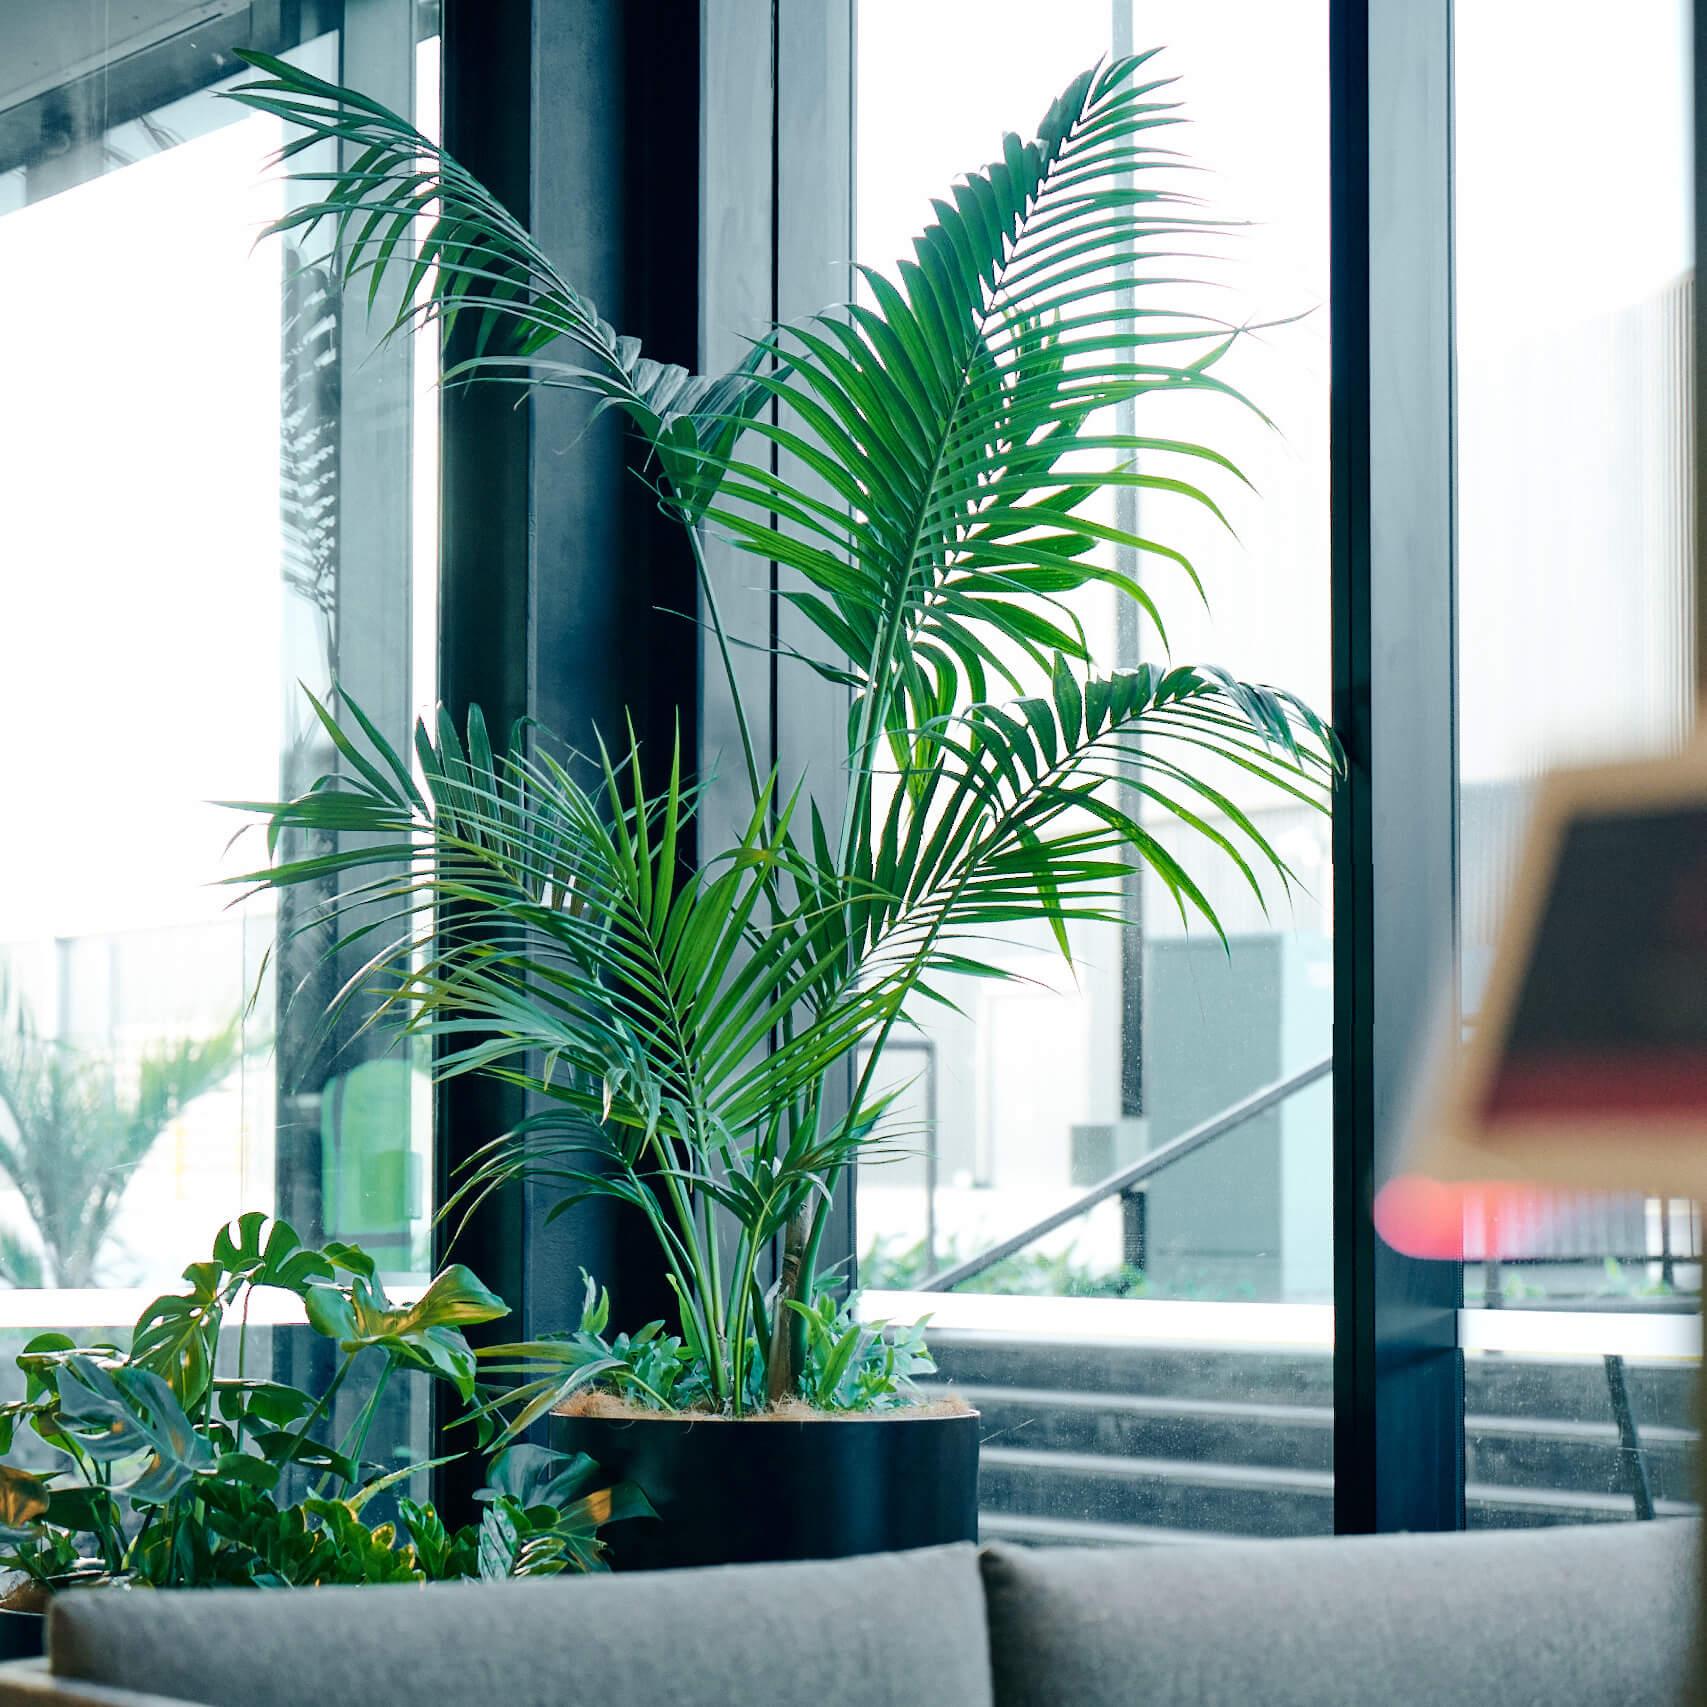 portfolio-offices-spaces-foodstuffs-image6